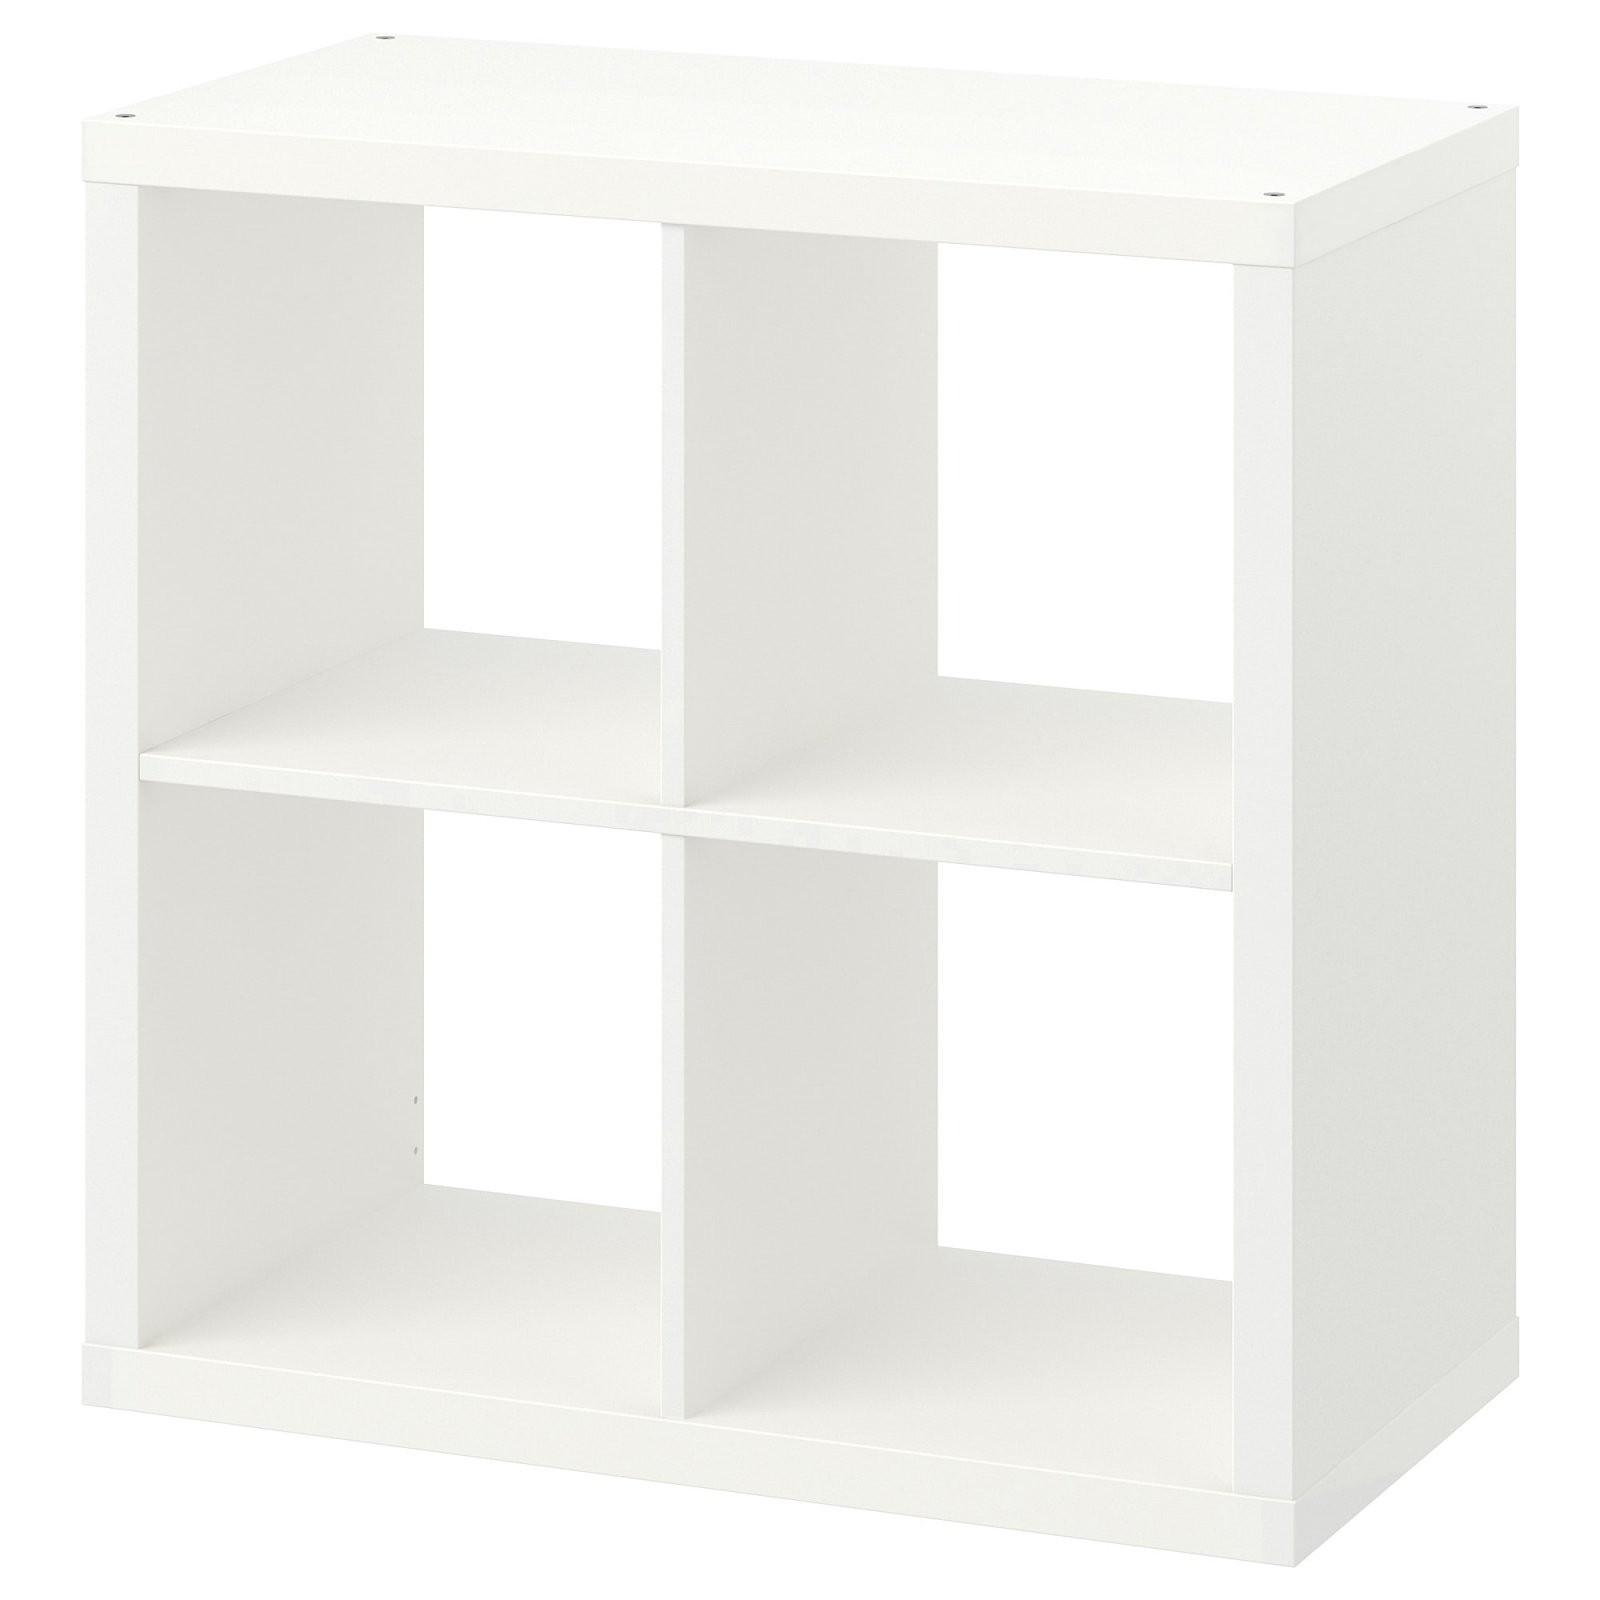 Kallax Regal  Weiß  Ikea von Ikea Regal Kallax Gebraucht Bild